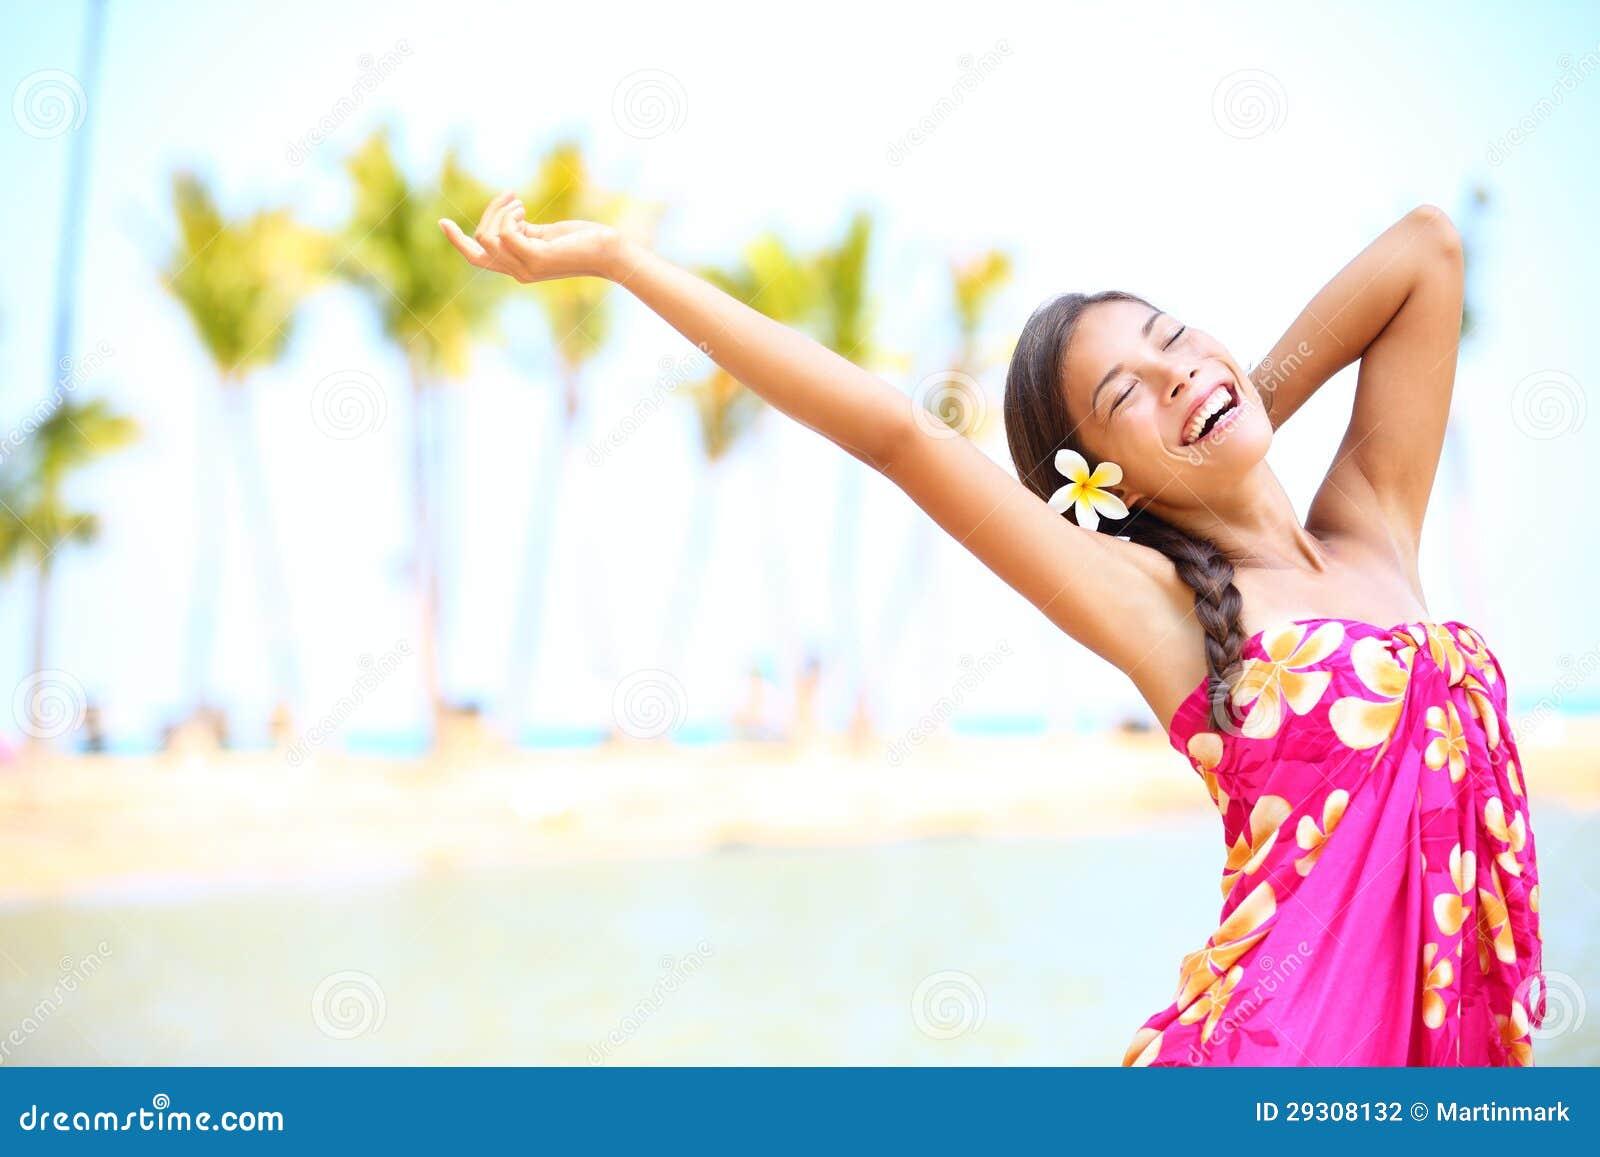 La gente felice sulla spiaggia viaggia - donna in sarong